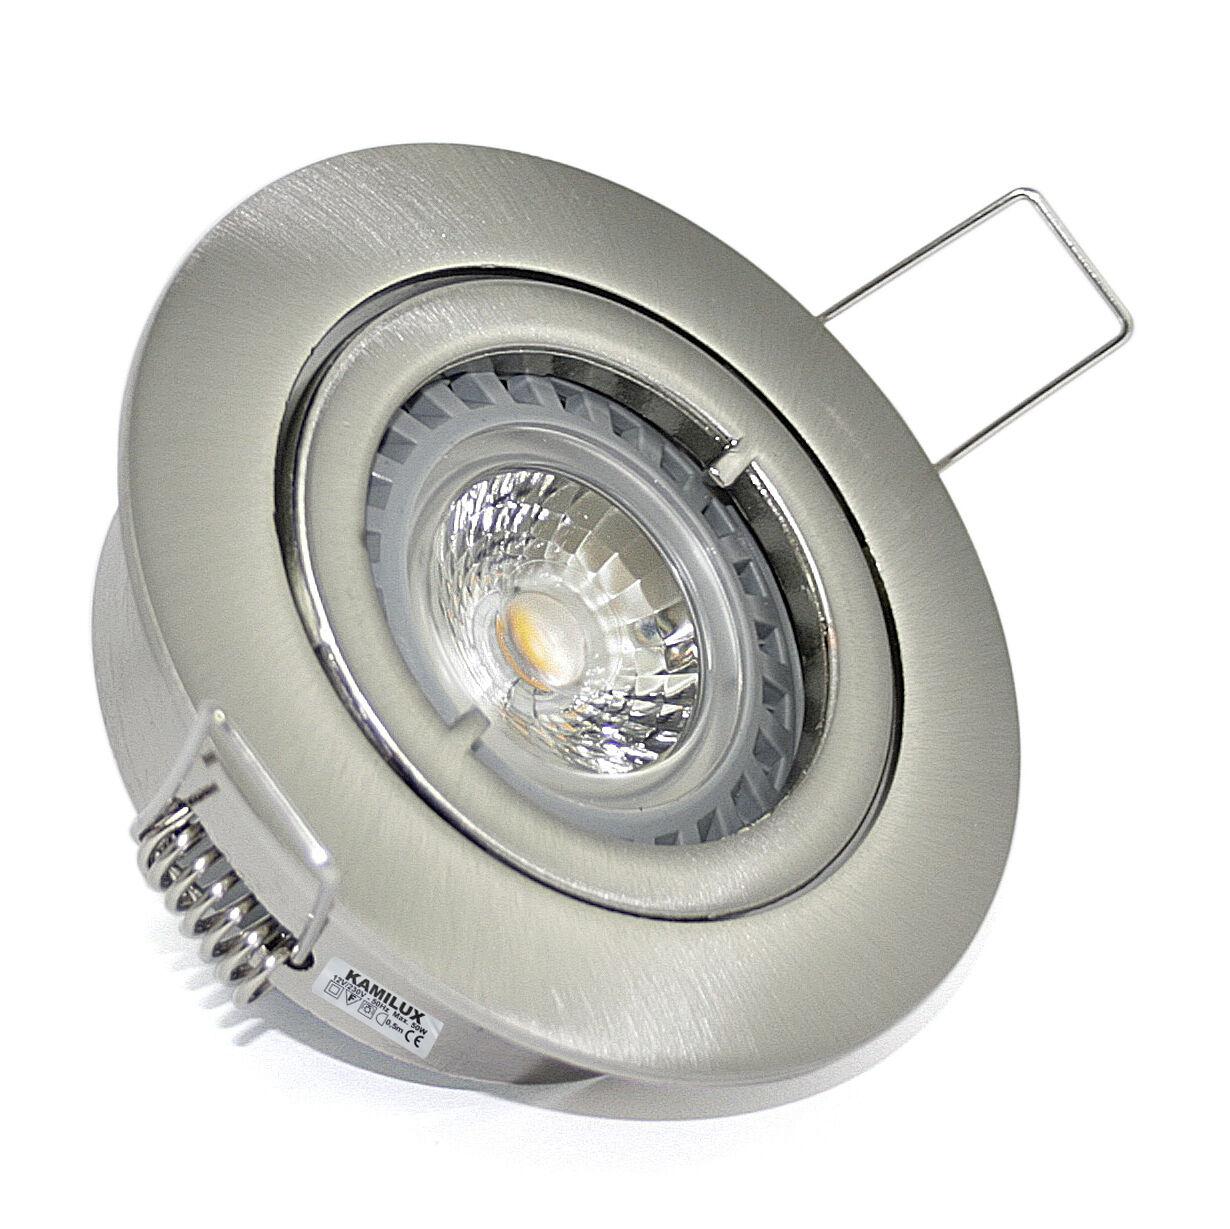 Bad Bad Bad Downlights 230V Hochvolt Kamilux  GU10 Fassung LED od Halogen ohne LM | Helle Farben  | Deutsche Outlets  | Modern  1f938e